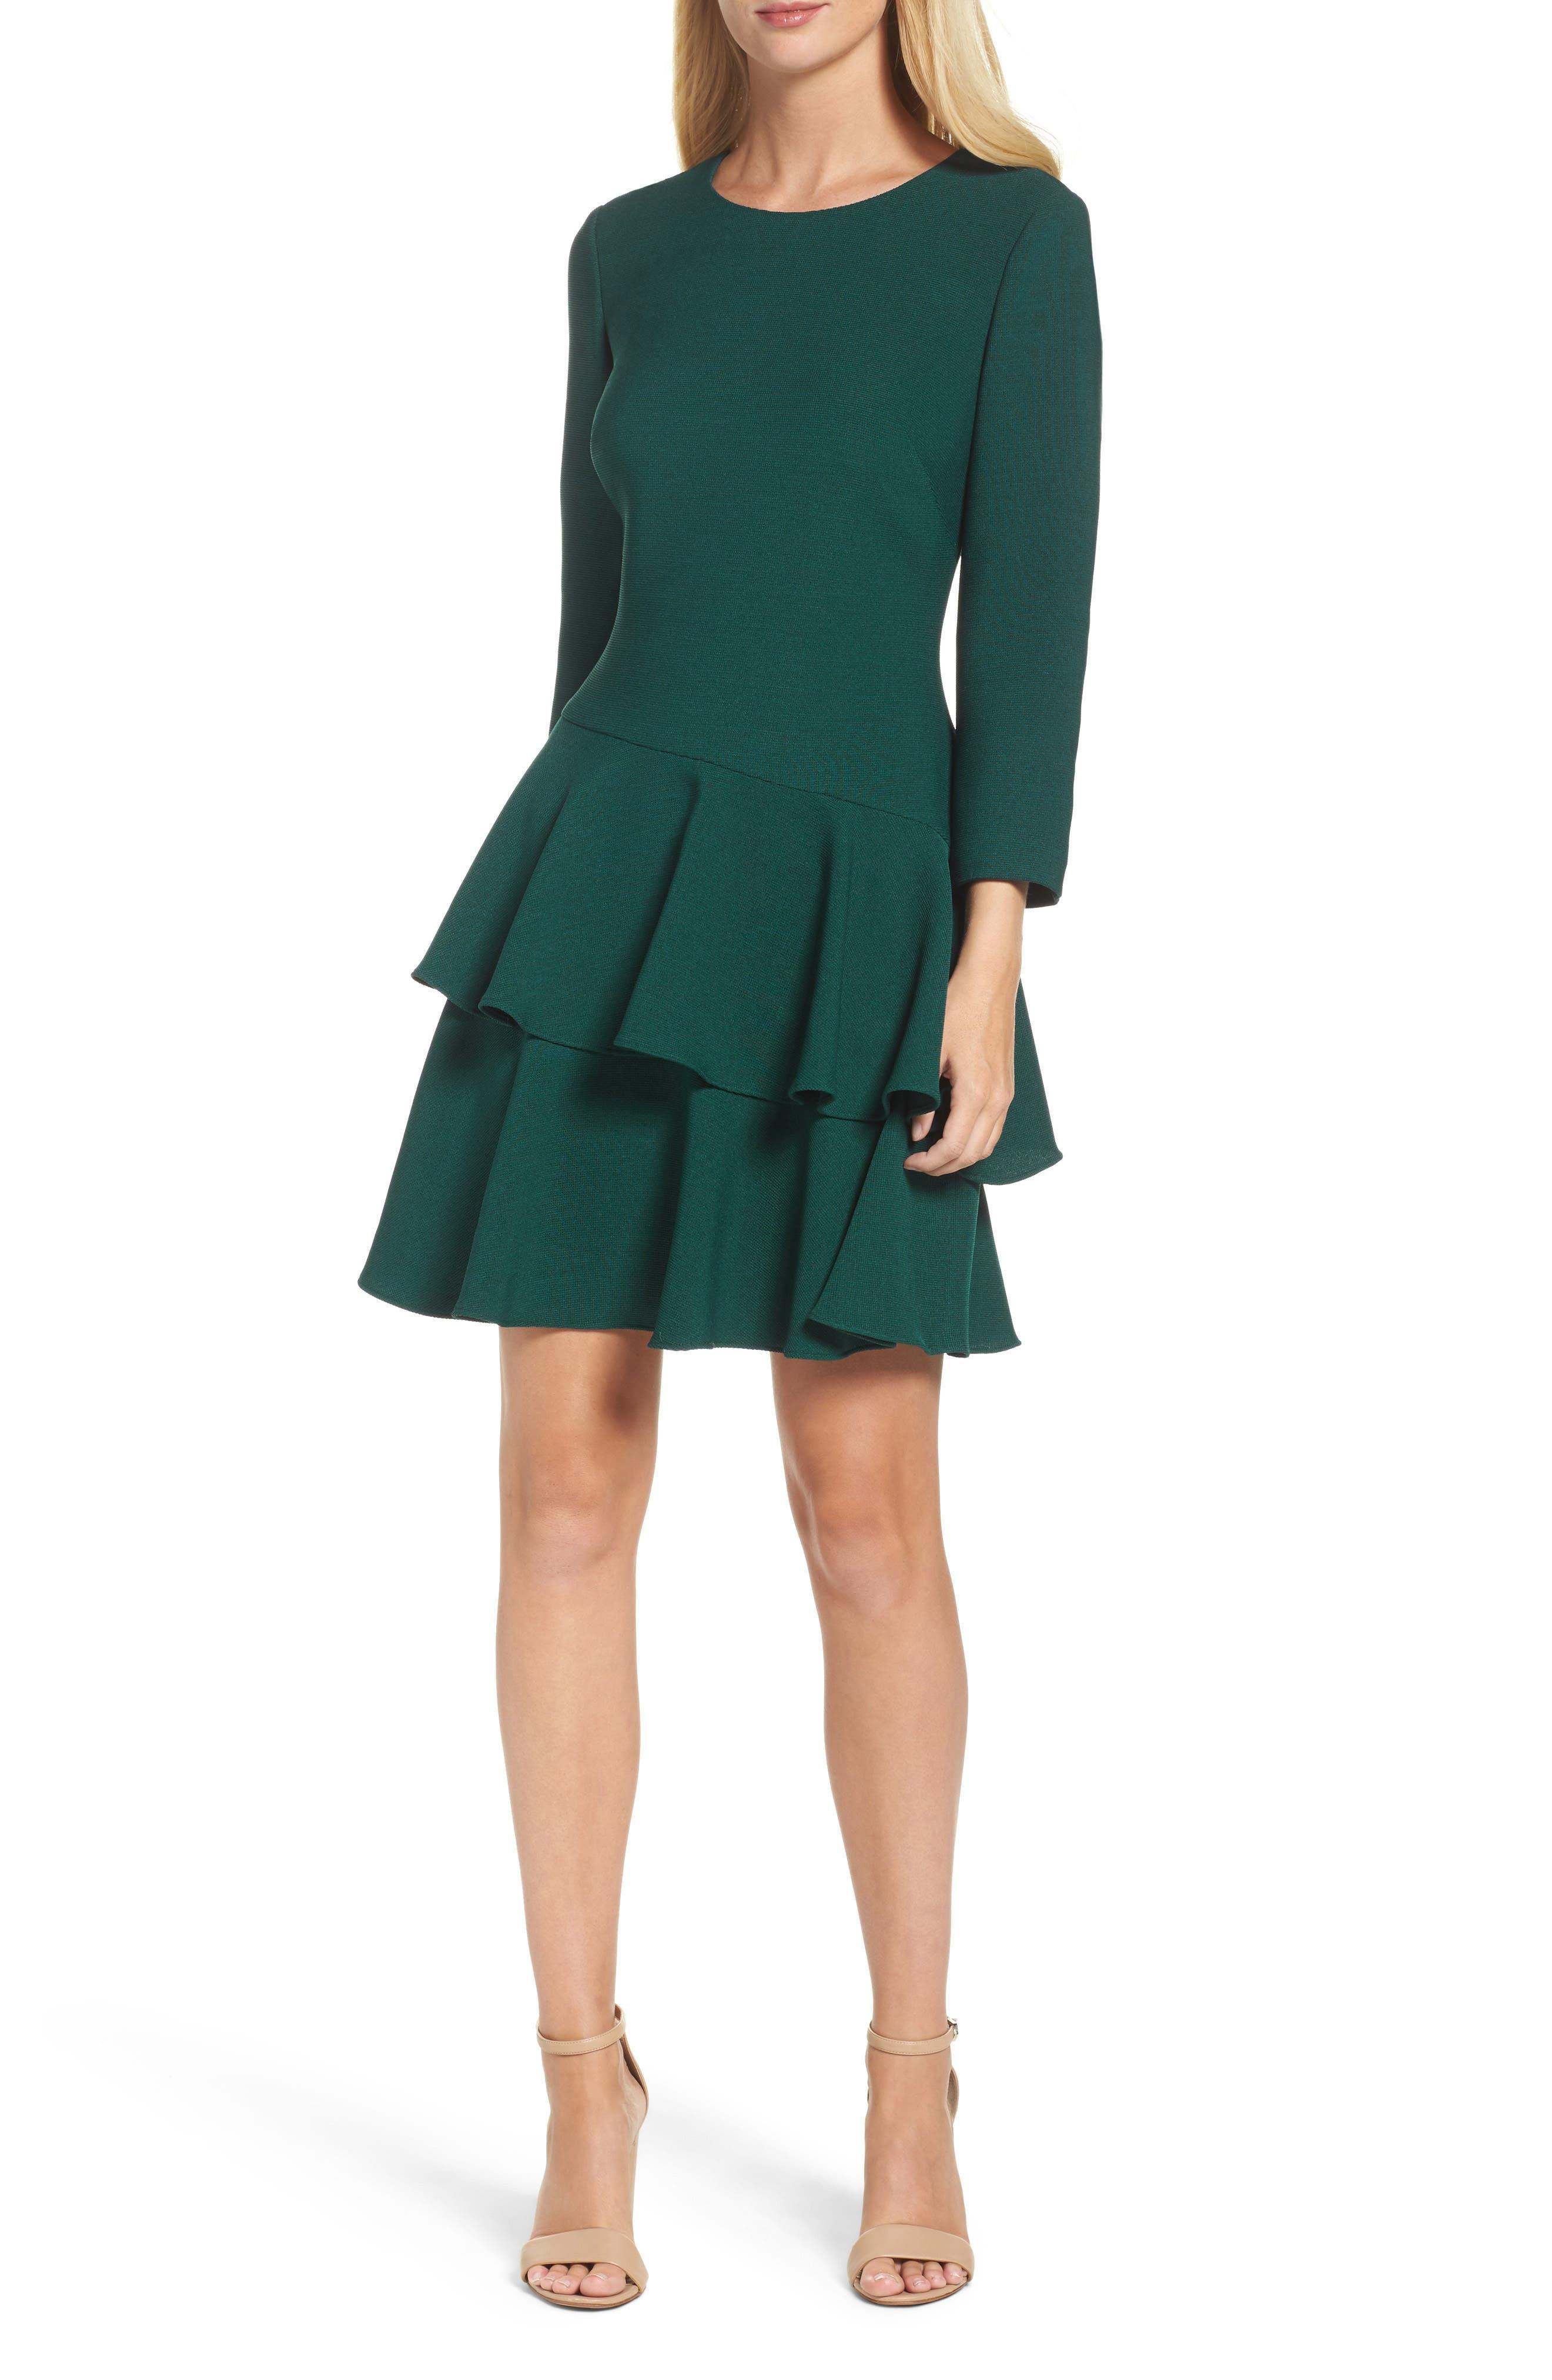 Alternate Image 1 Selected - Eliza J Tiered Ruffle Knit Dress (Regular & Petite)